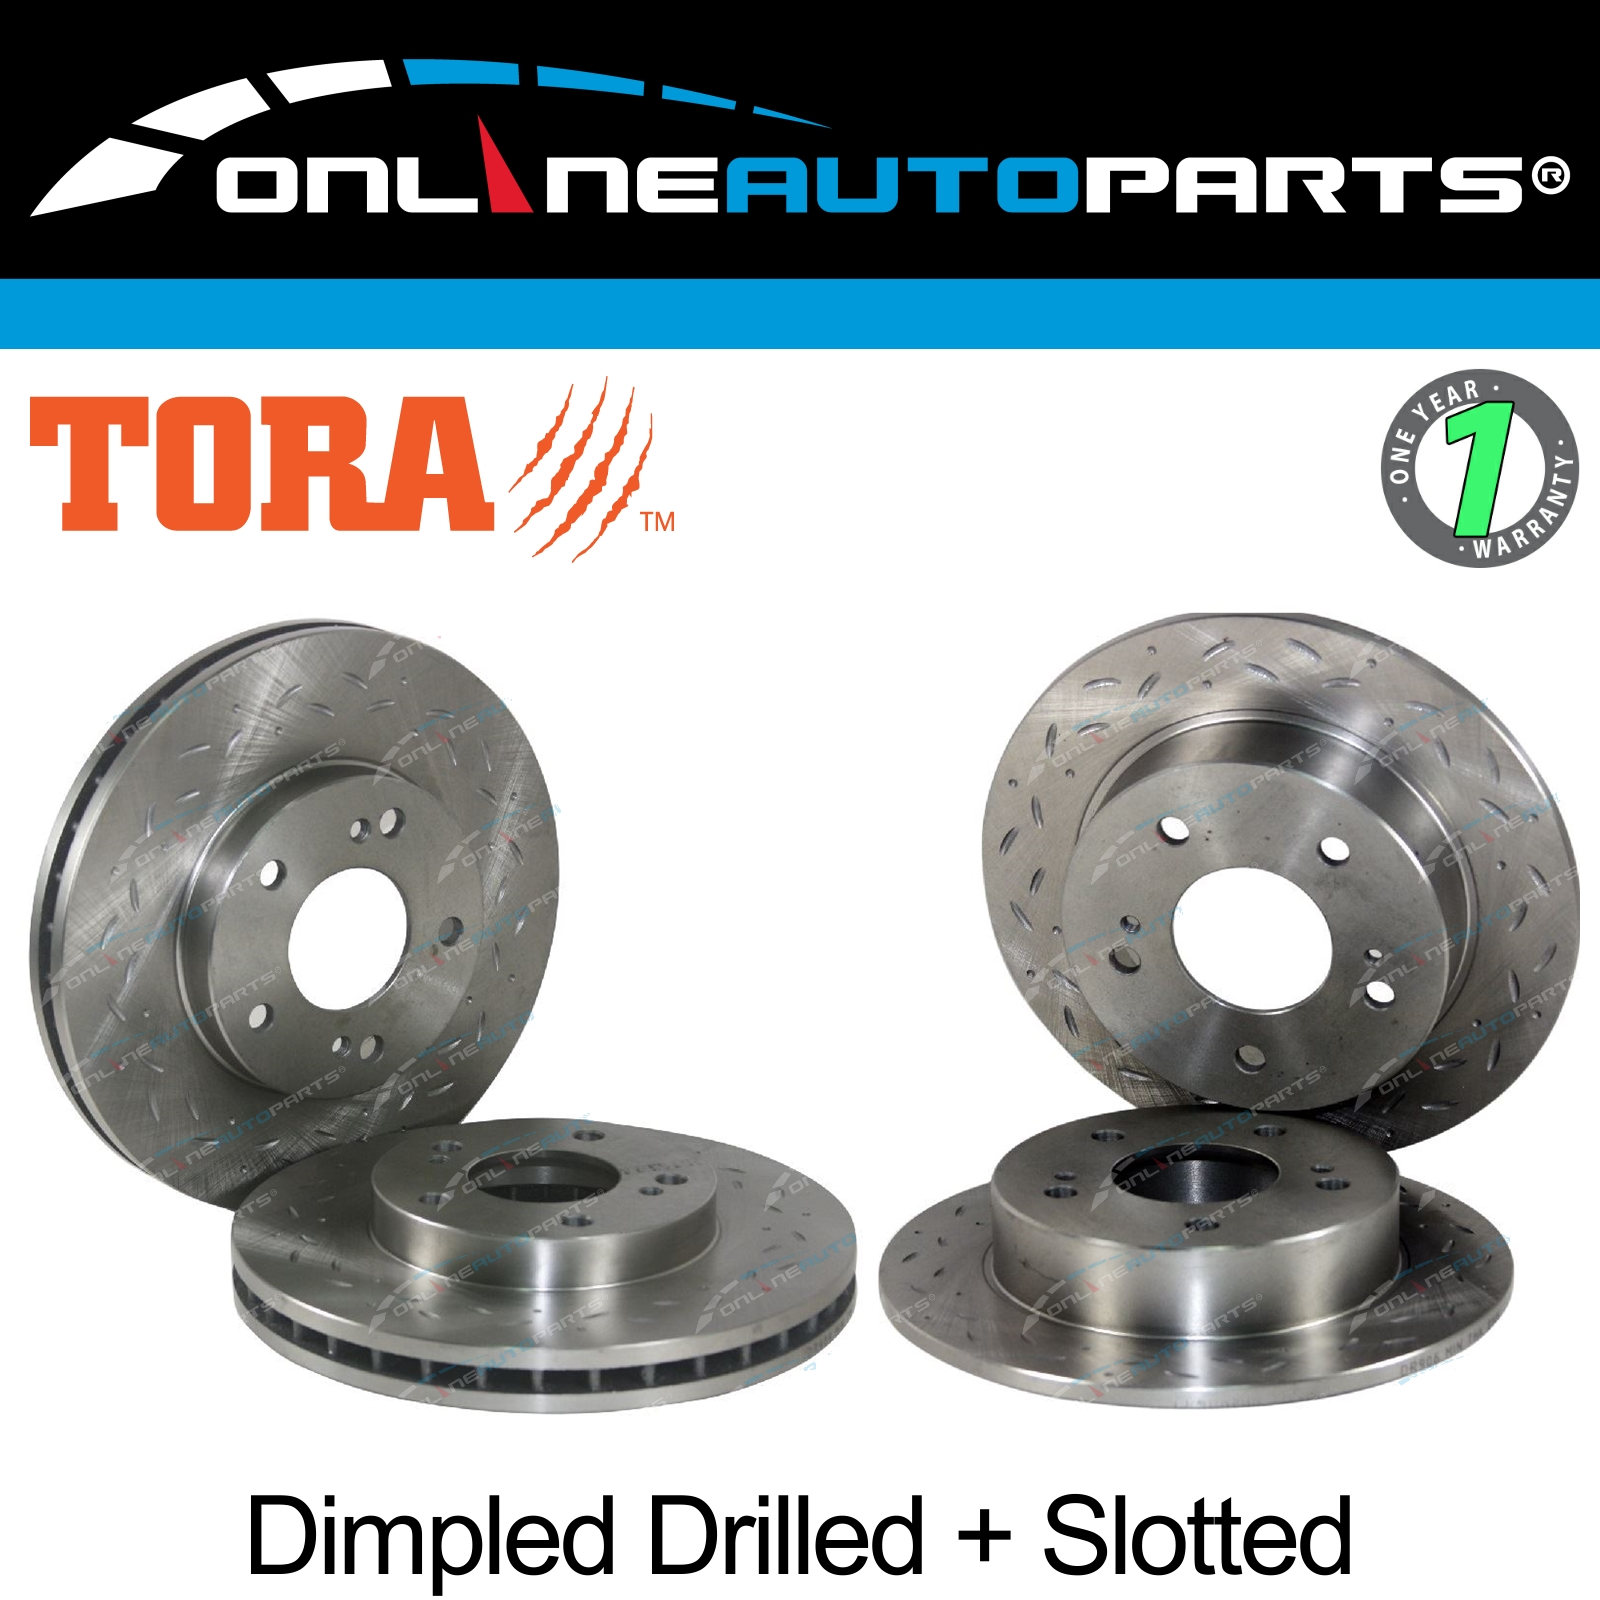 2 Front Dimple Slotted Disc Brake Rotors suit 200SX S14 S15 300ZX Z32 VG30DDT